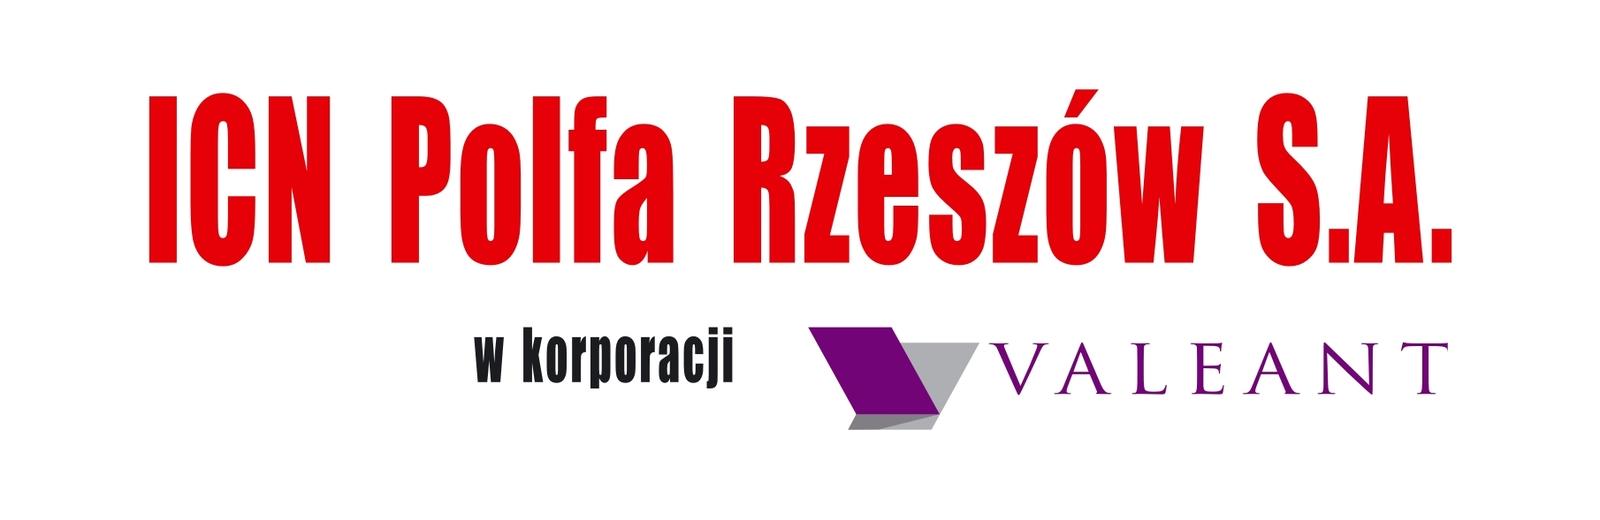 icn_polfa_rzeszow_sa_logo.jpg